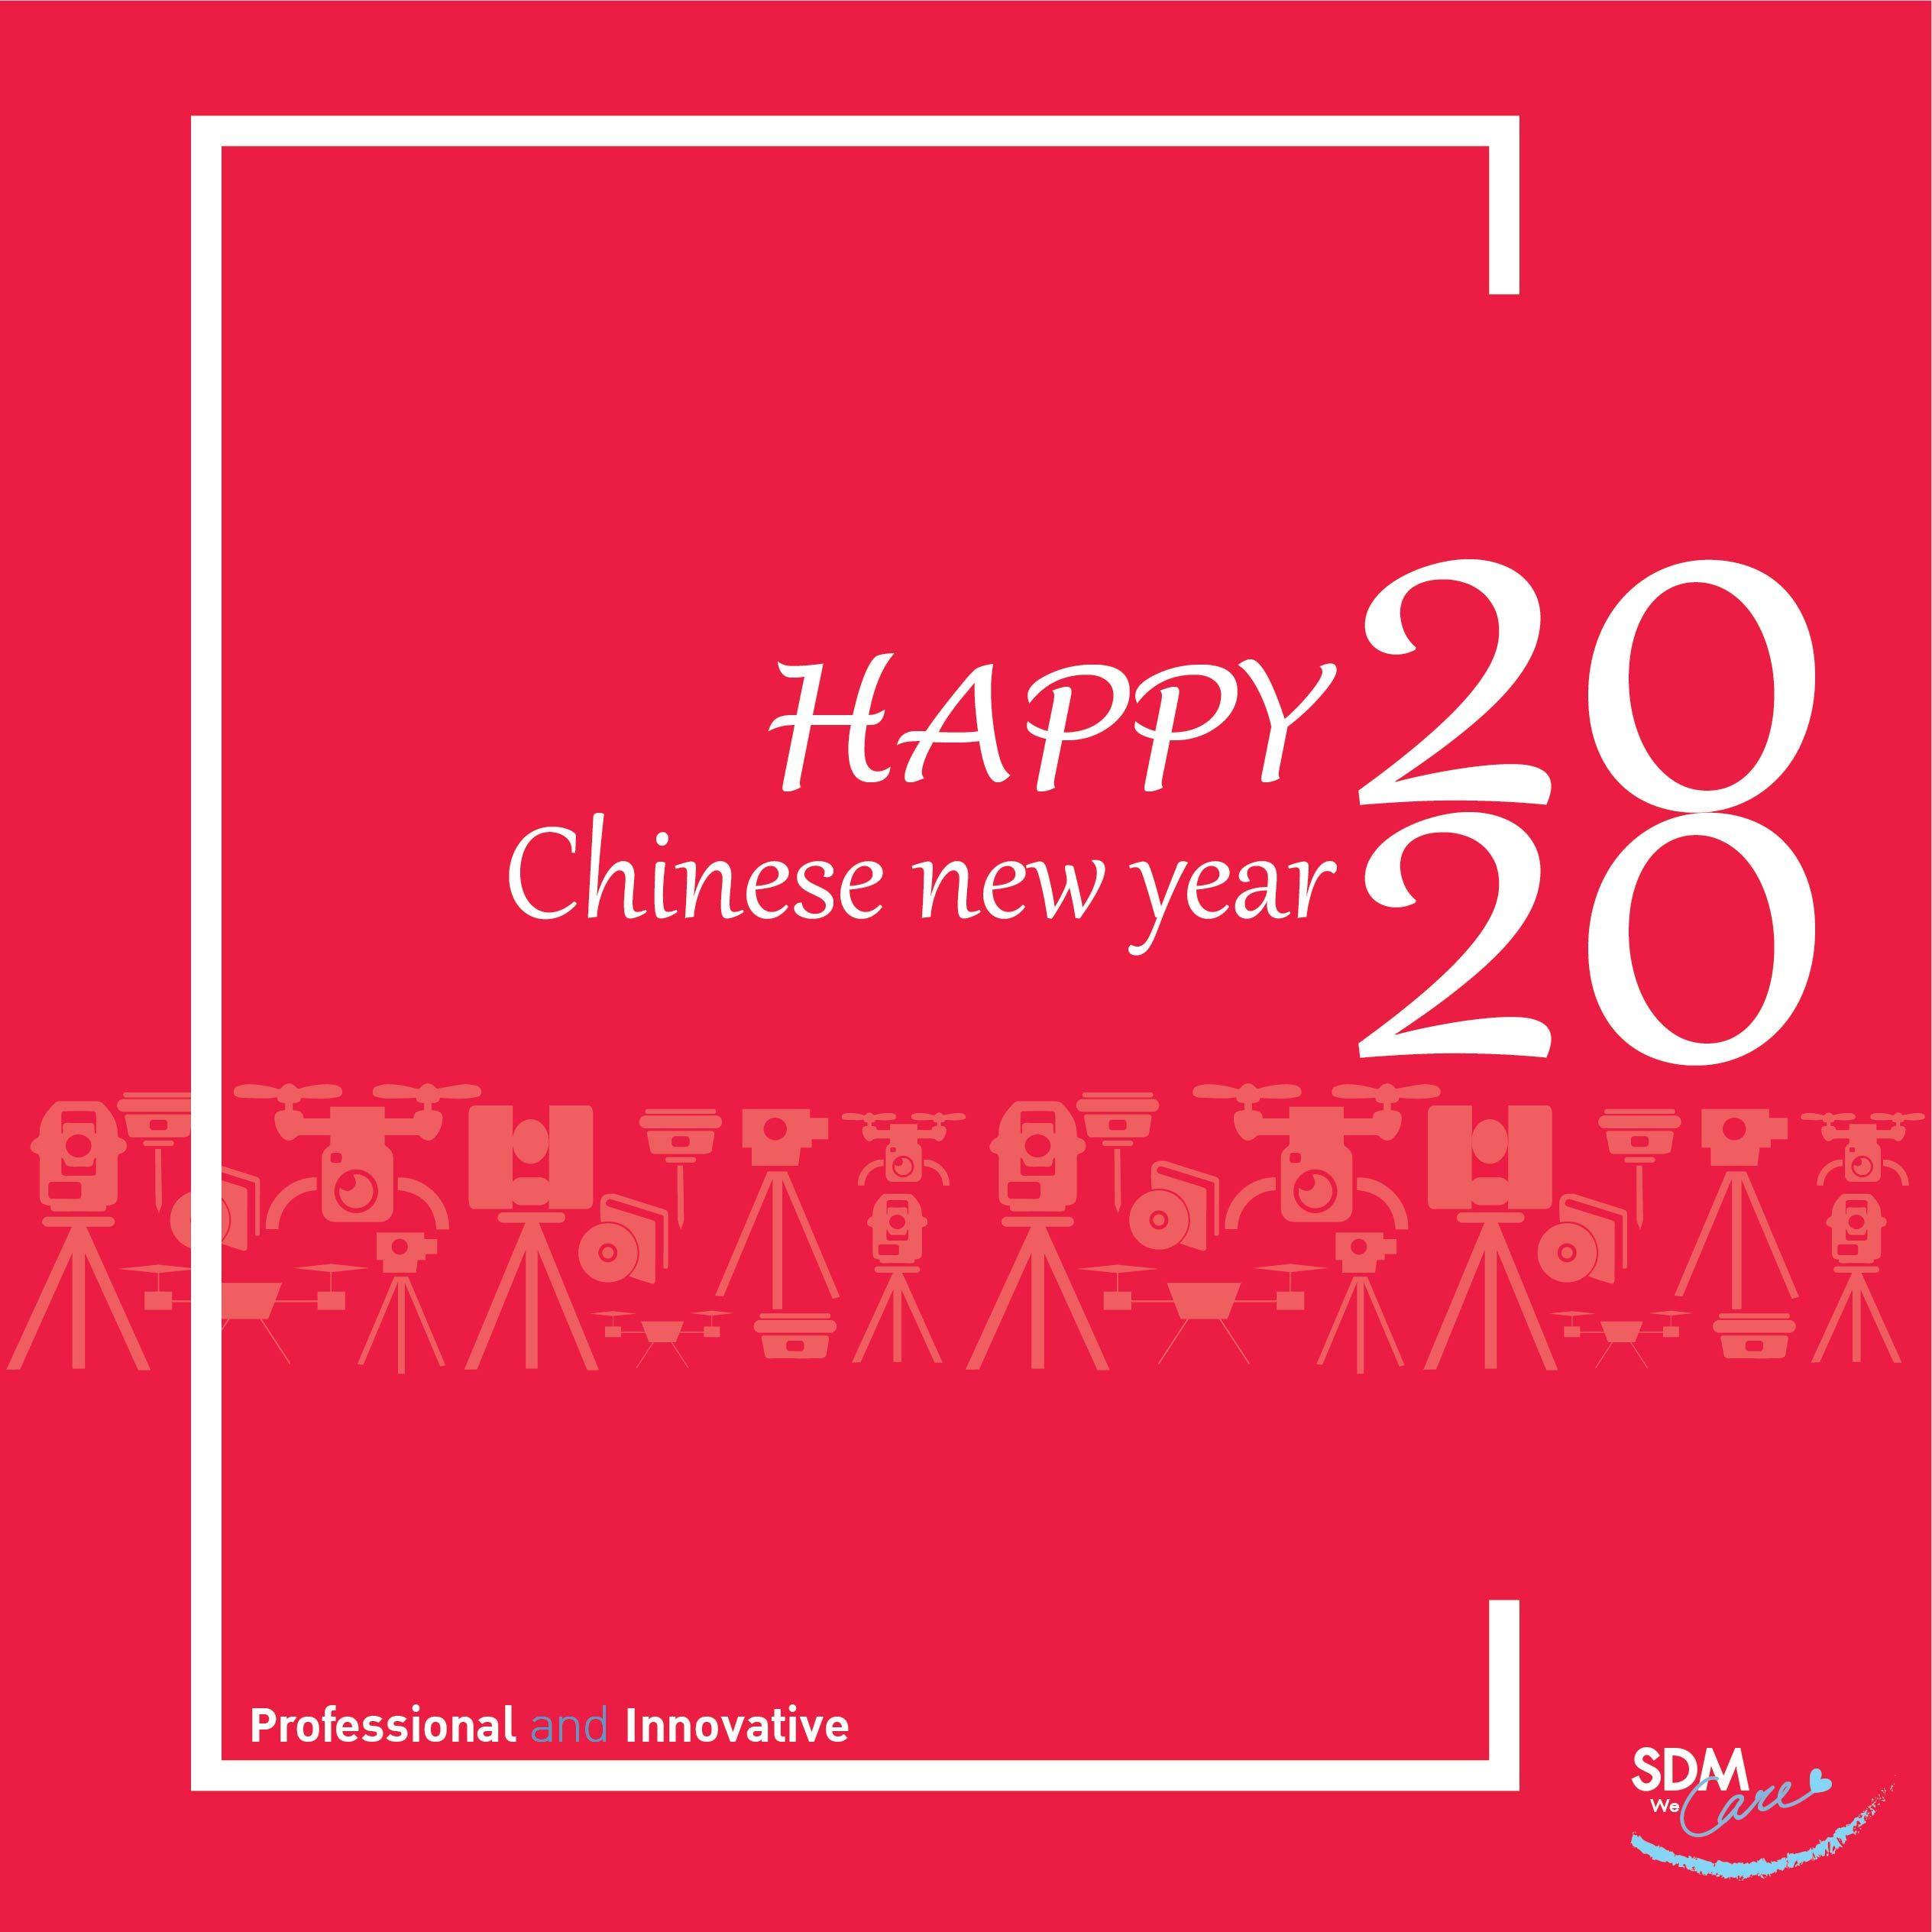 happy new year 2020 , สวัสดีปีหนู 2563, วันตรุษจีน 2563